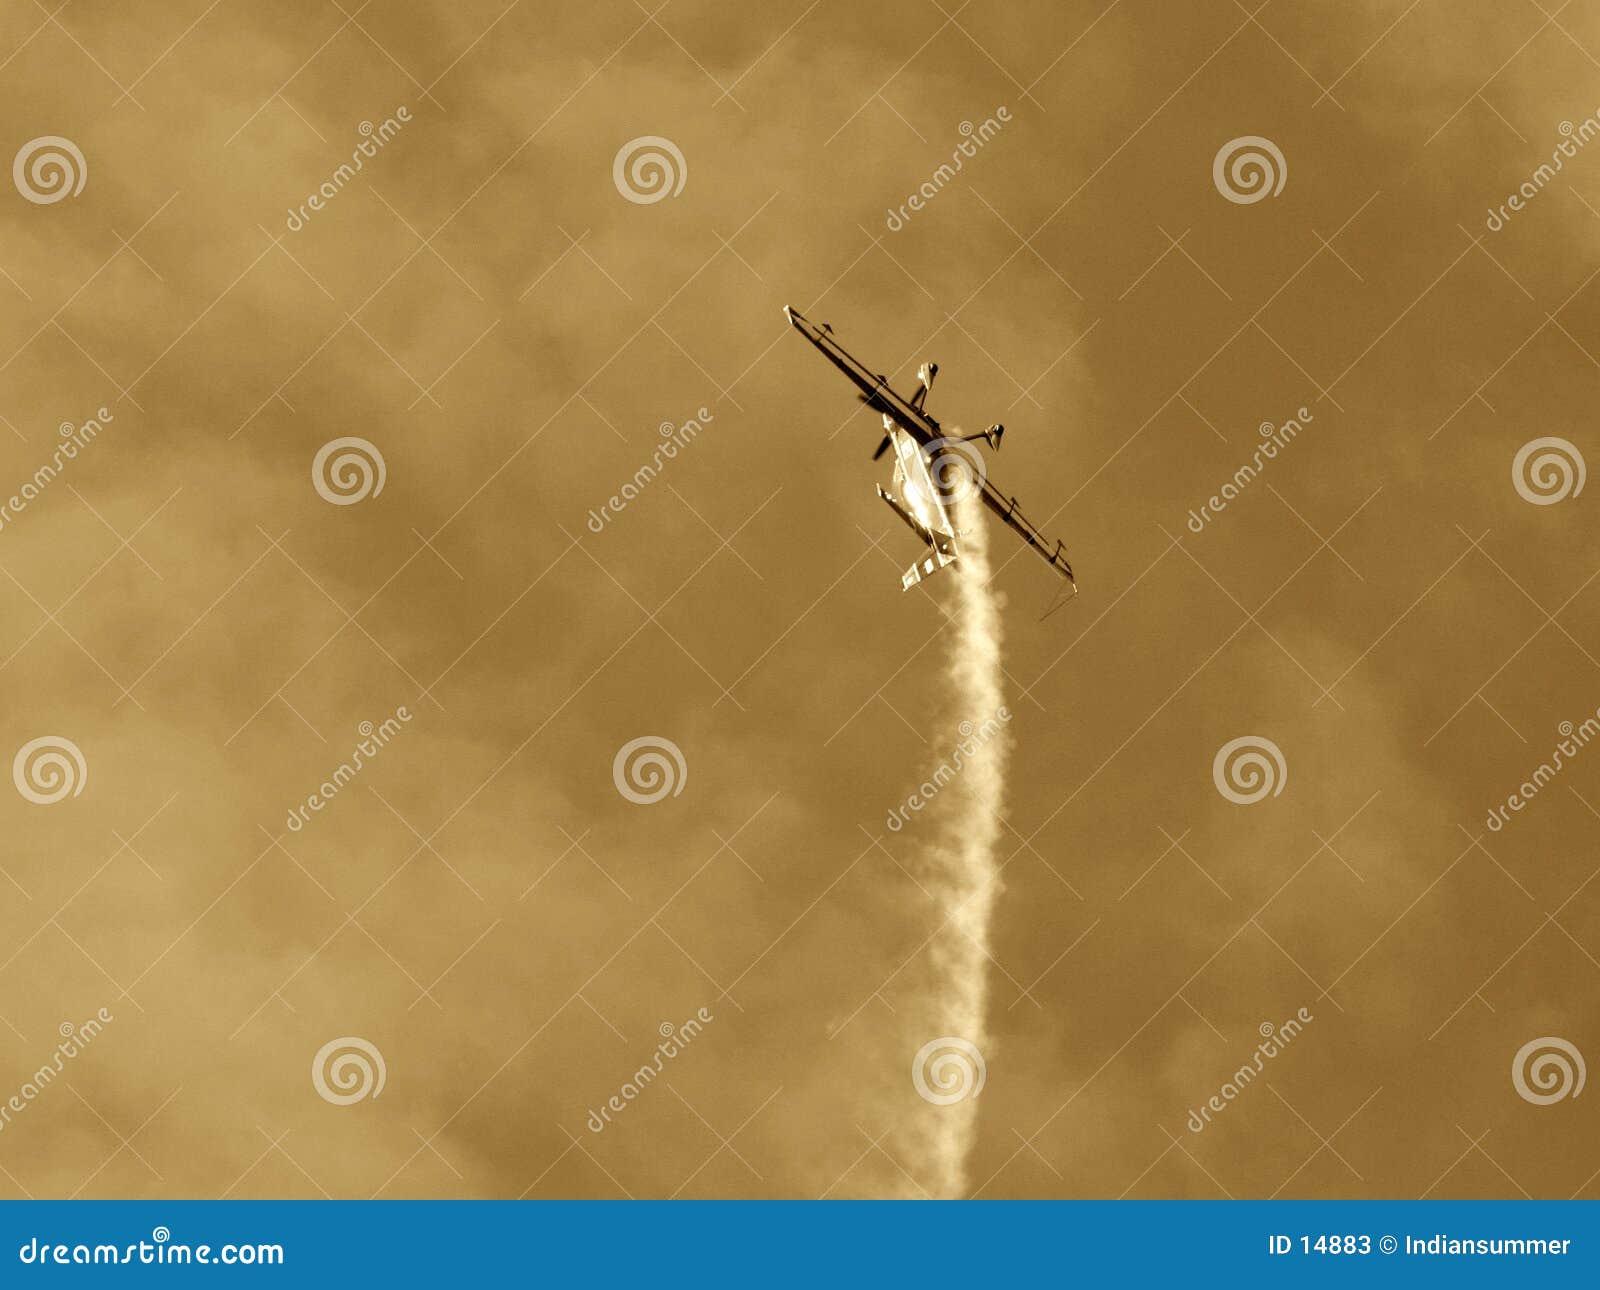 Upside-down plane